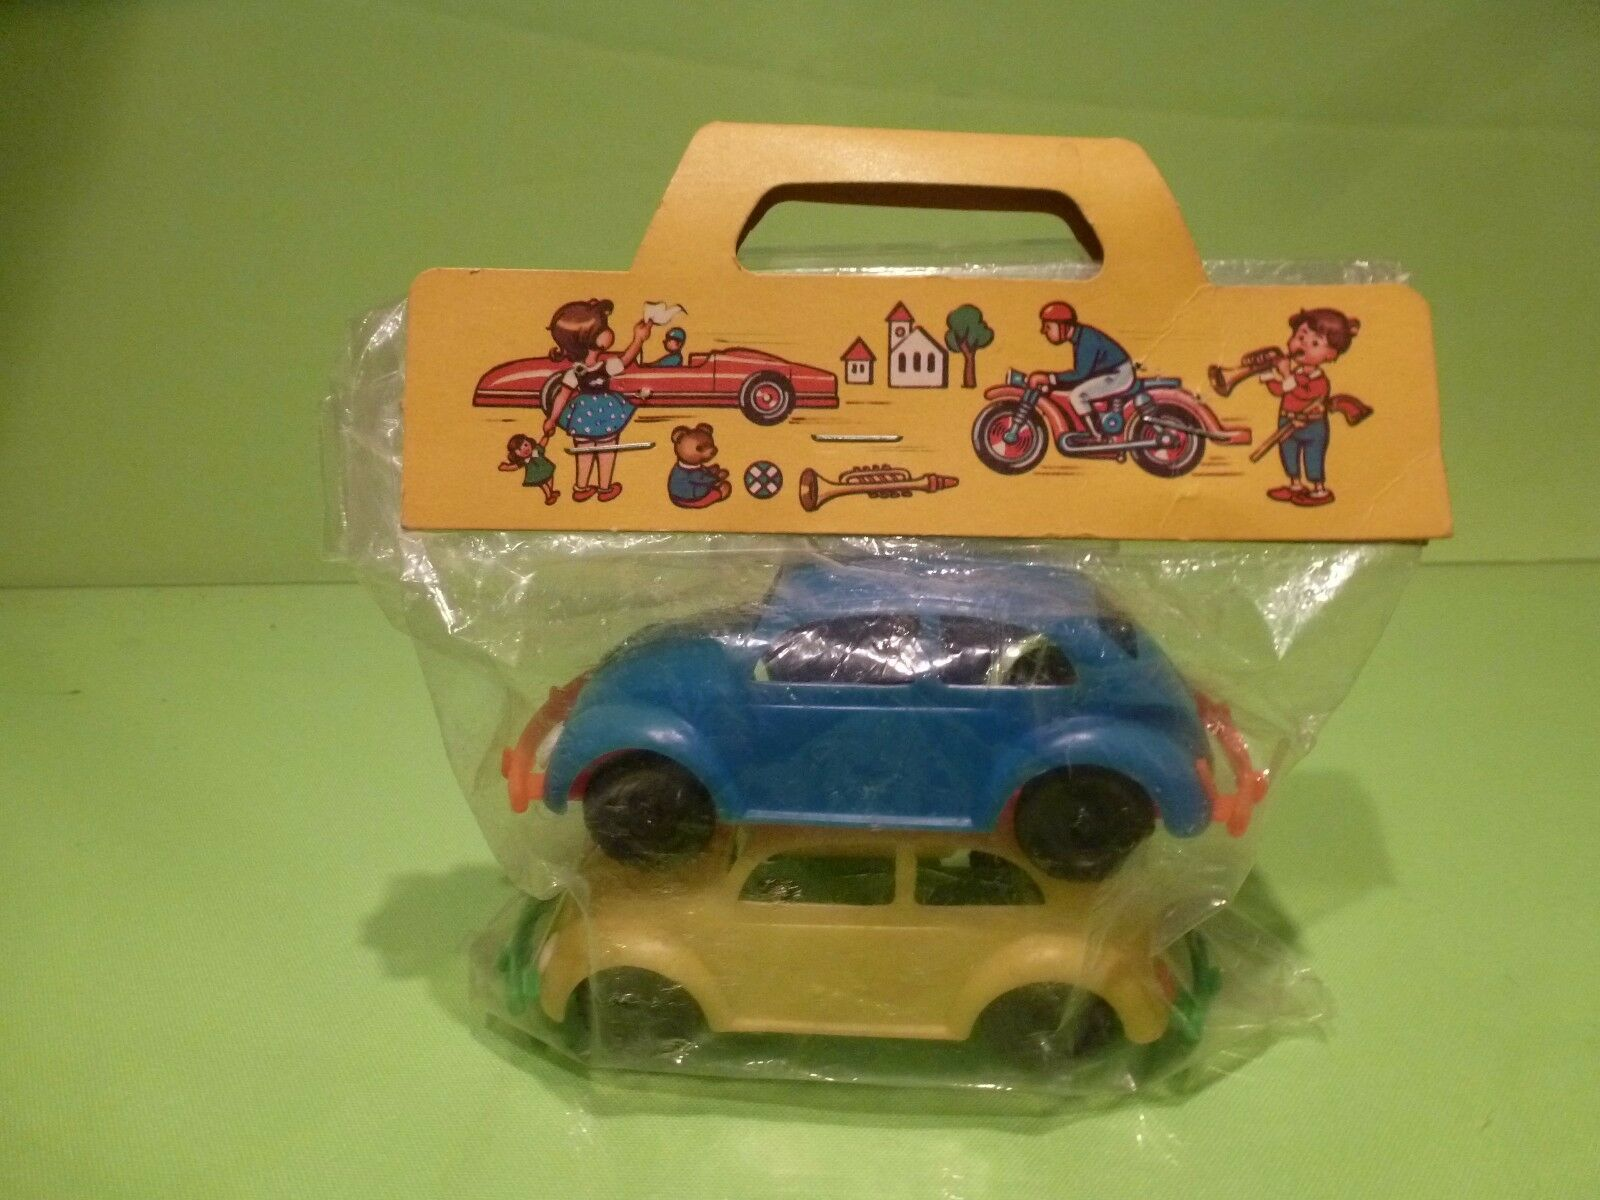 VINTAGE GERhomme PLASTIC 2x VW VOLKSWAGEN BEETLE - BUG  - bleu + jaune GOOD IN sac  wholesape pas cher